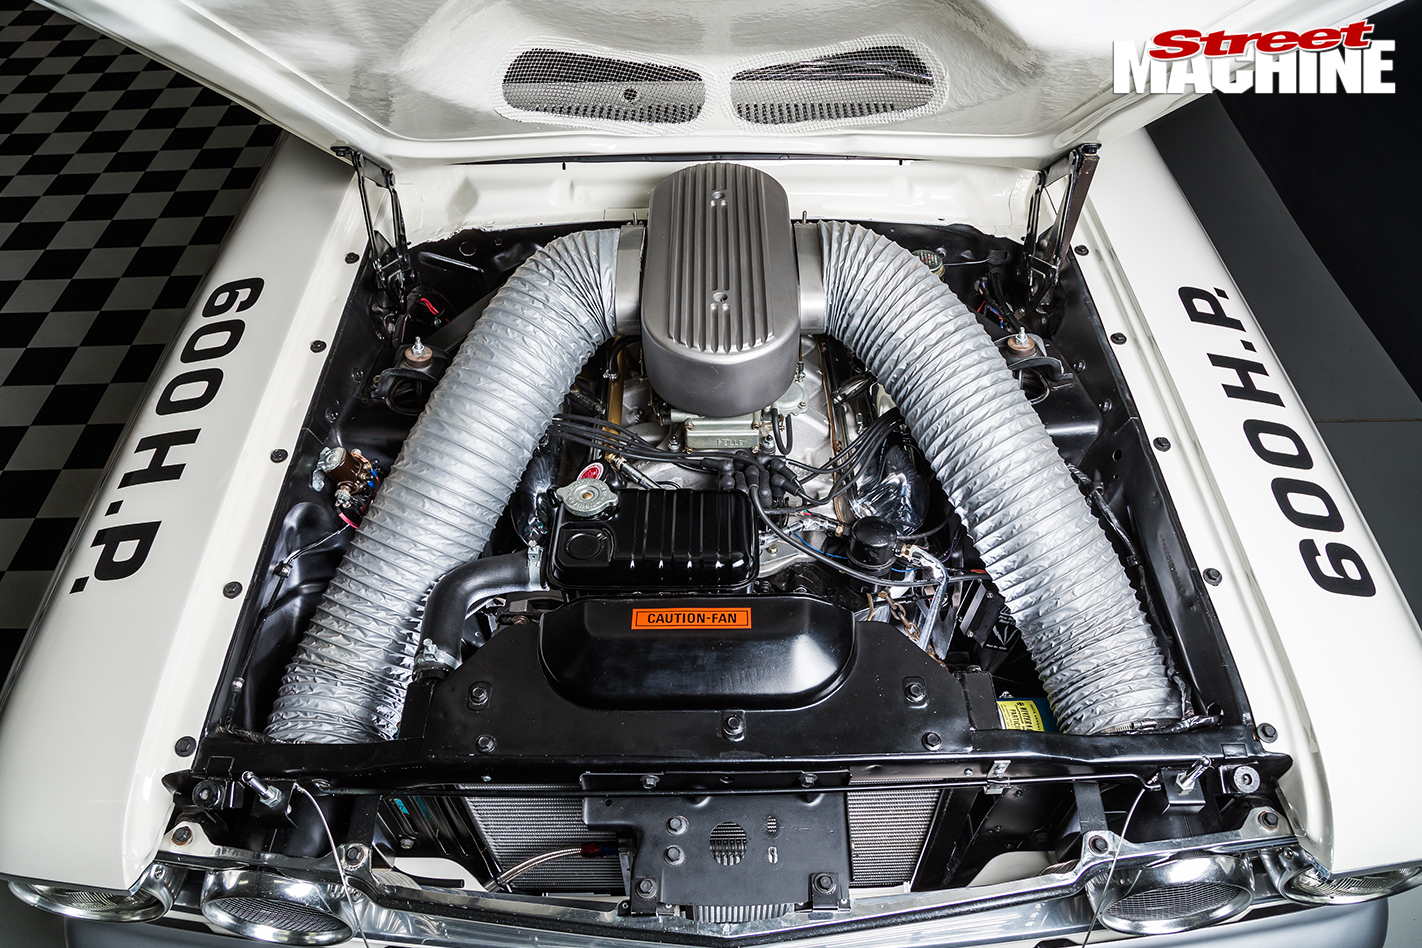 REPLICA-FORD-FAIRLANE-THUNDERBOLT-engine -1